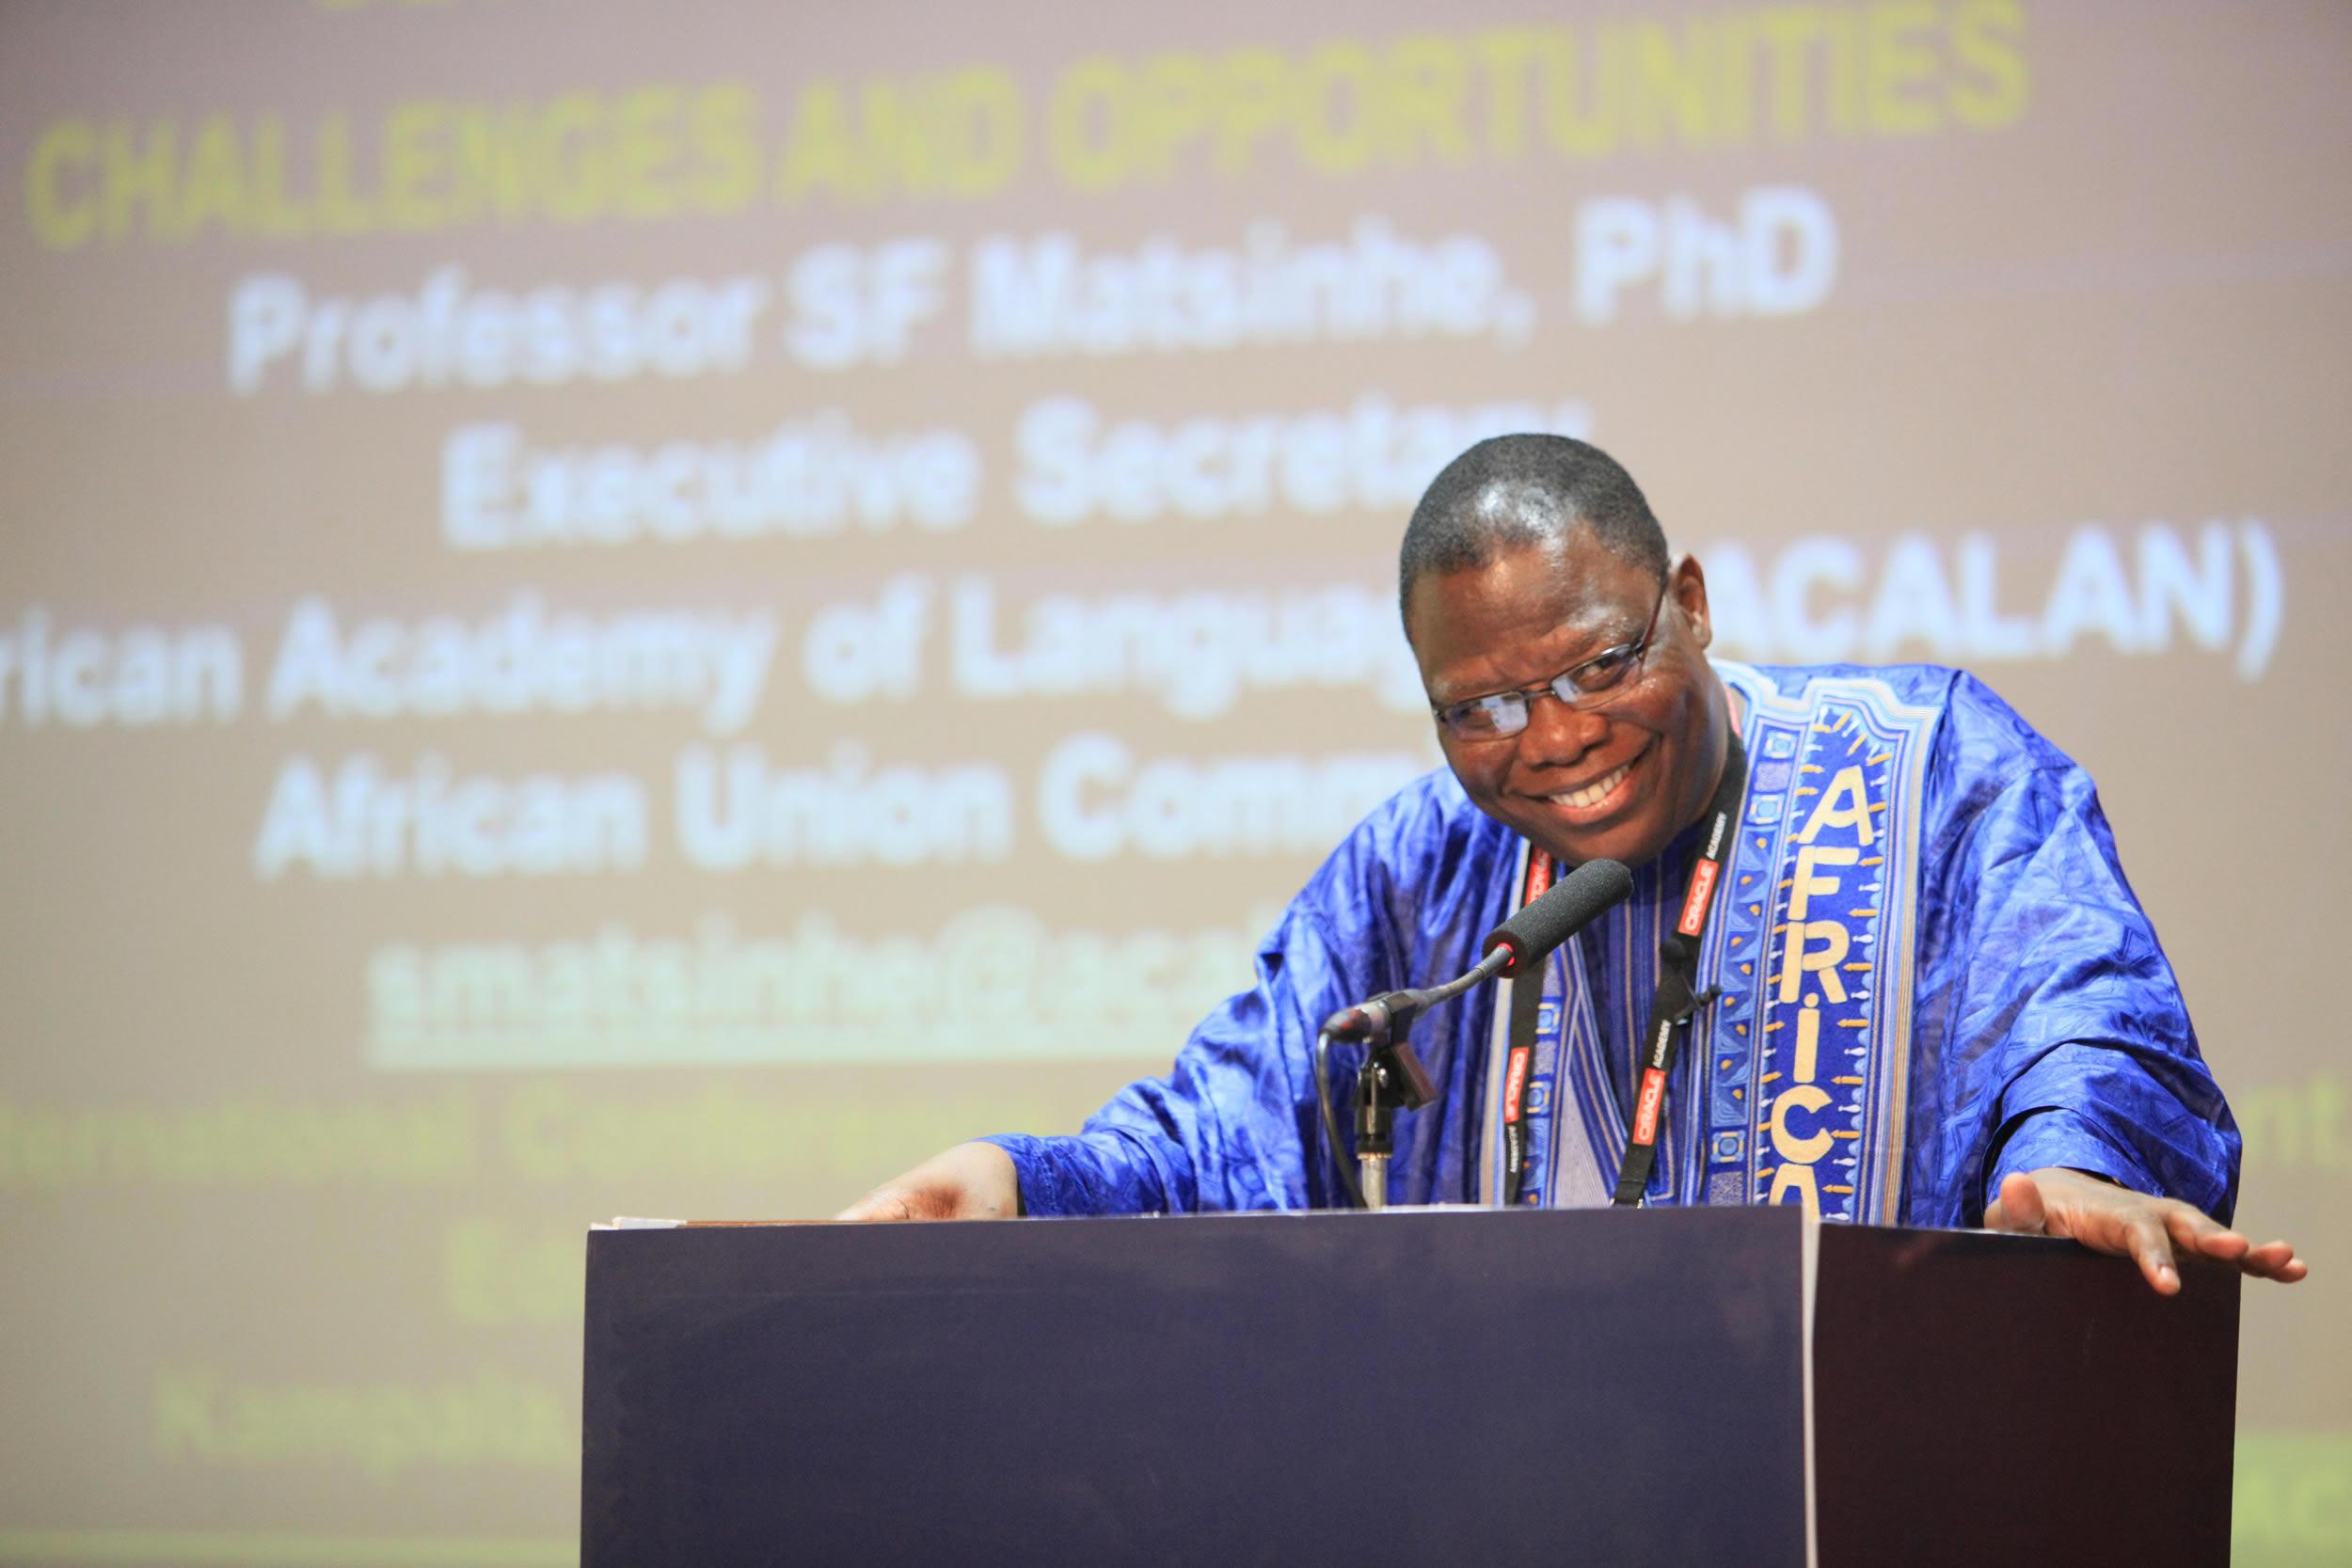 Citations mémorables d'eLearning Africa